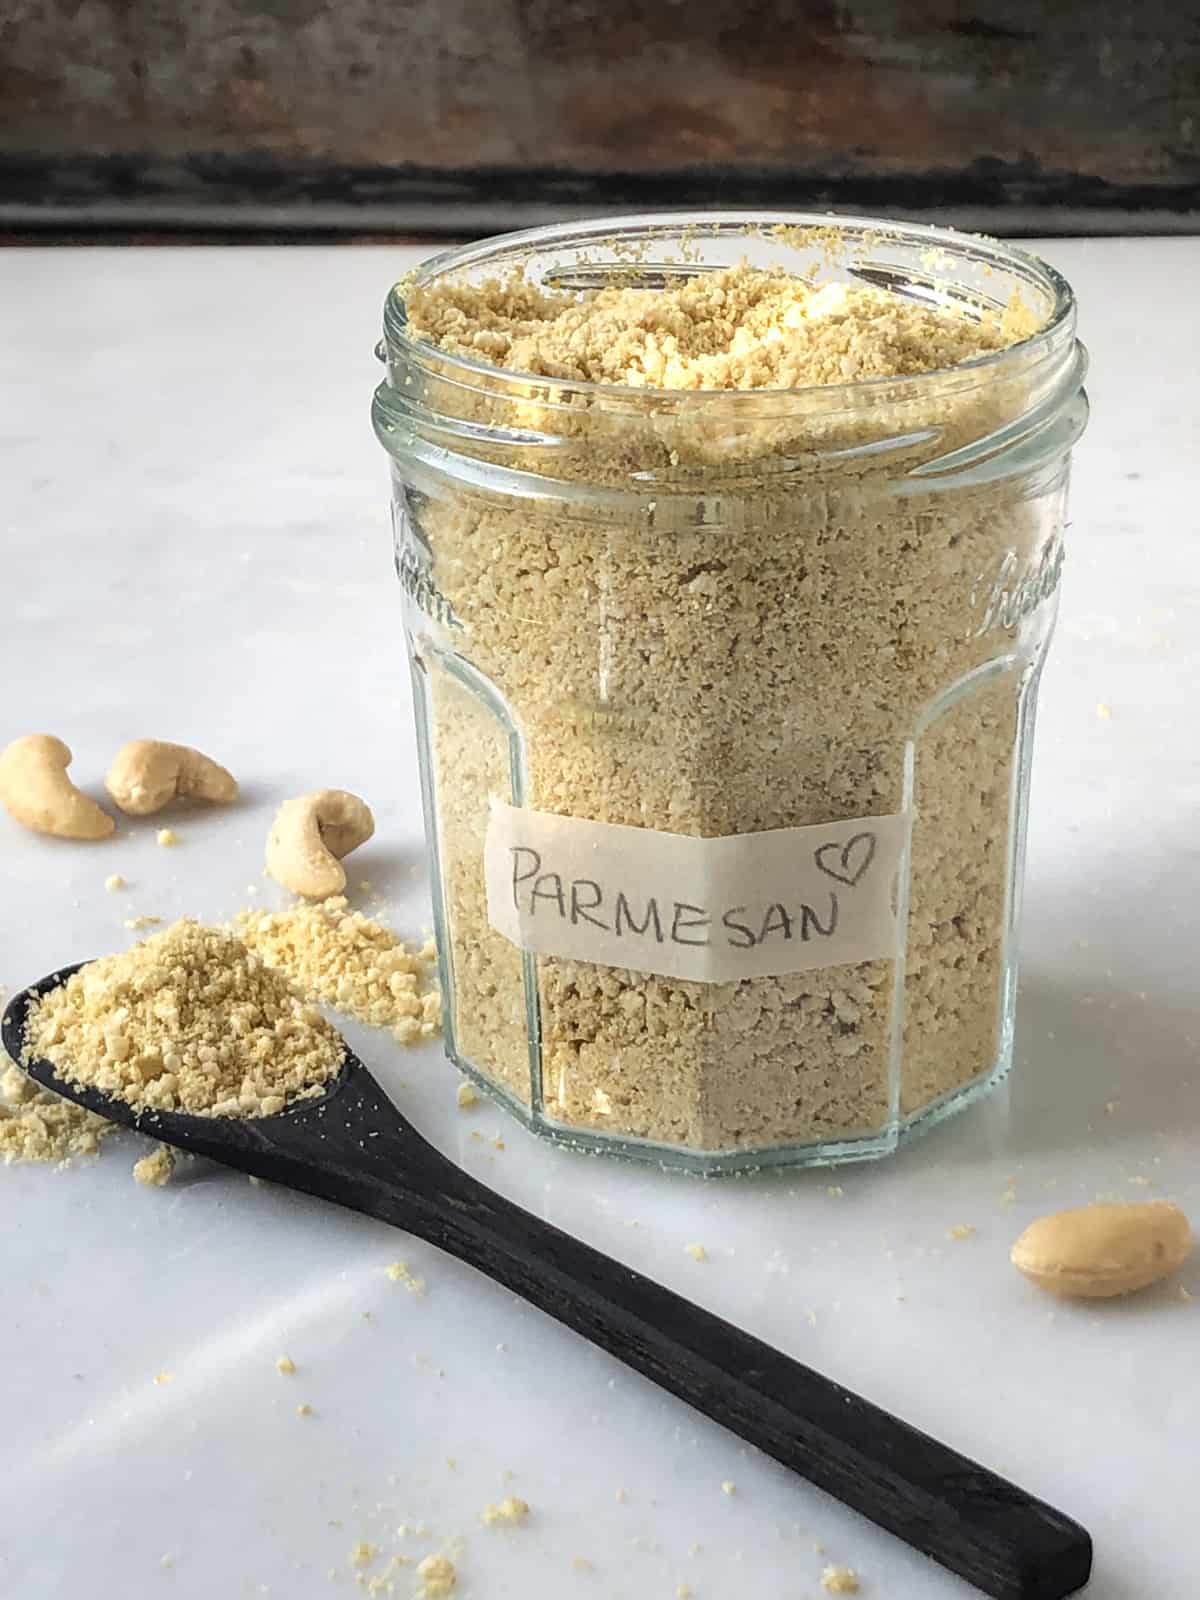 Jarful of vegan parmesan cheese alternative.